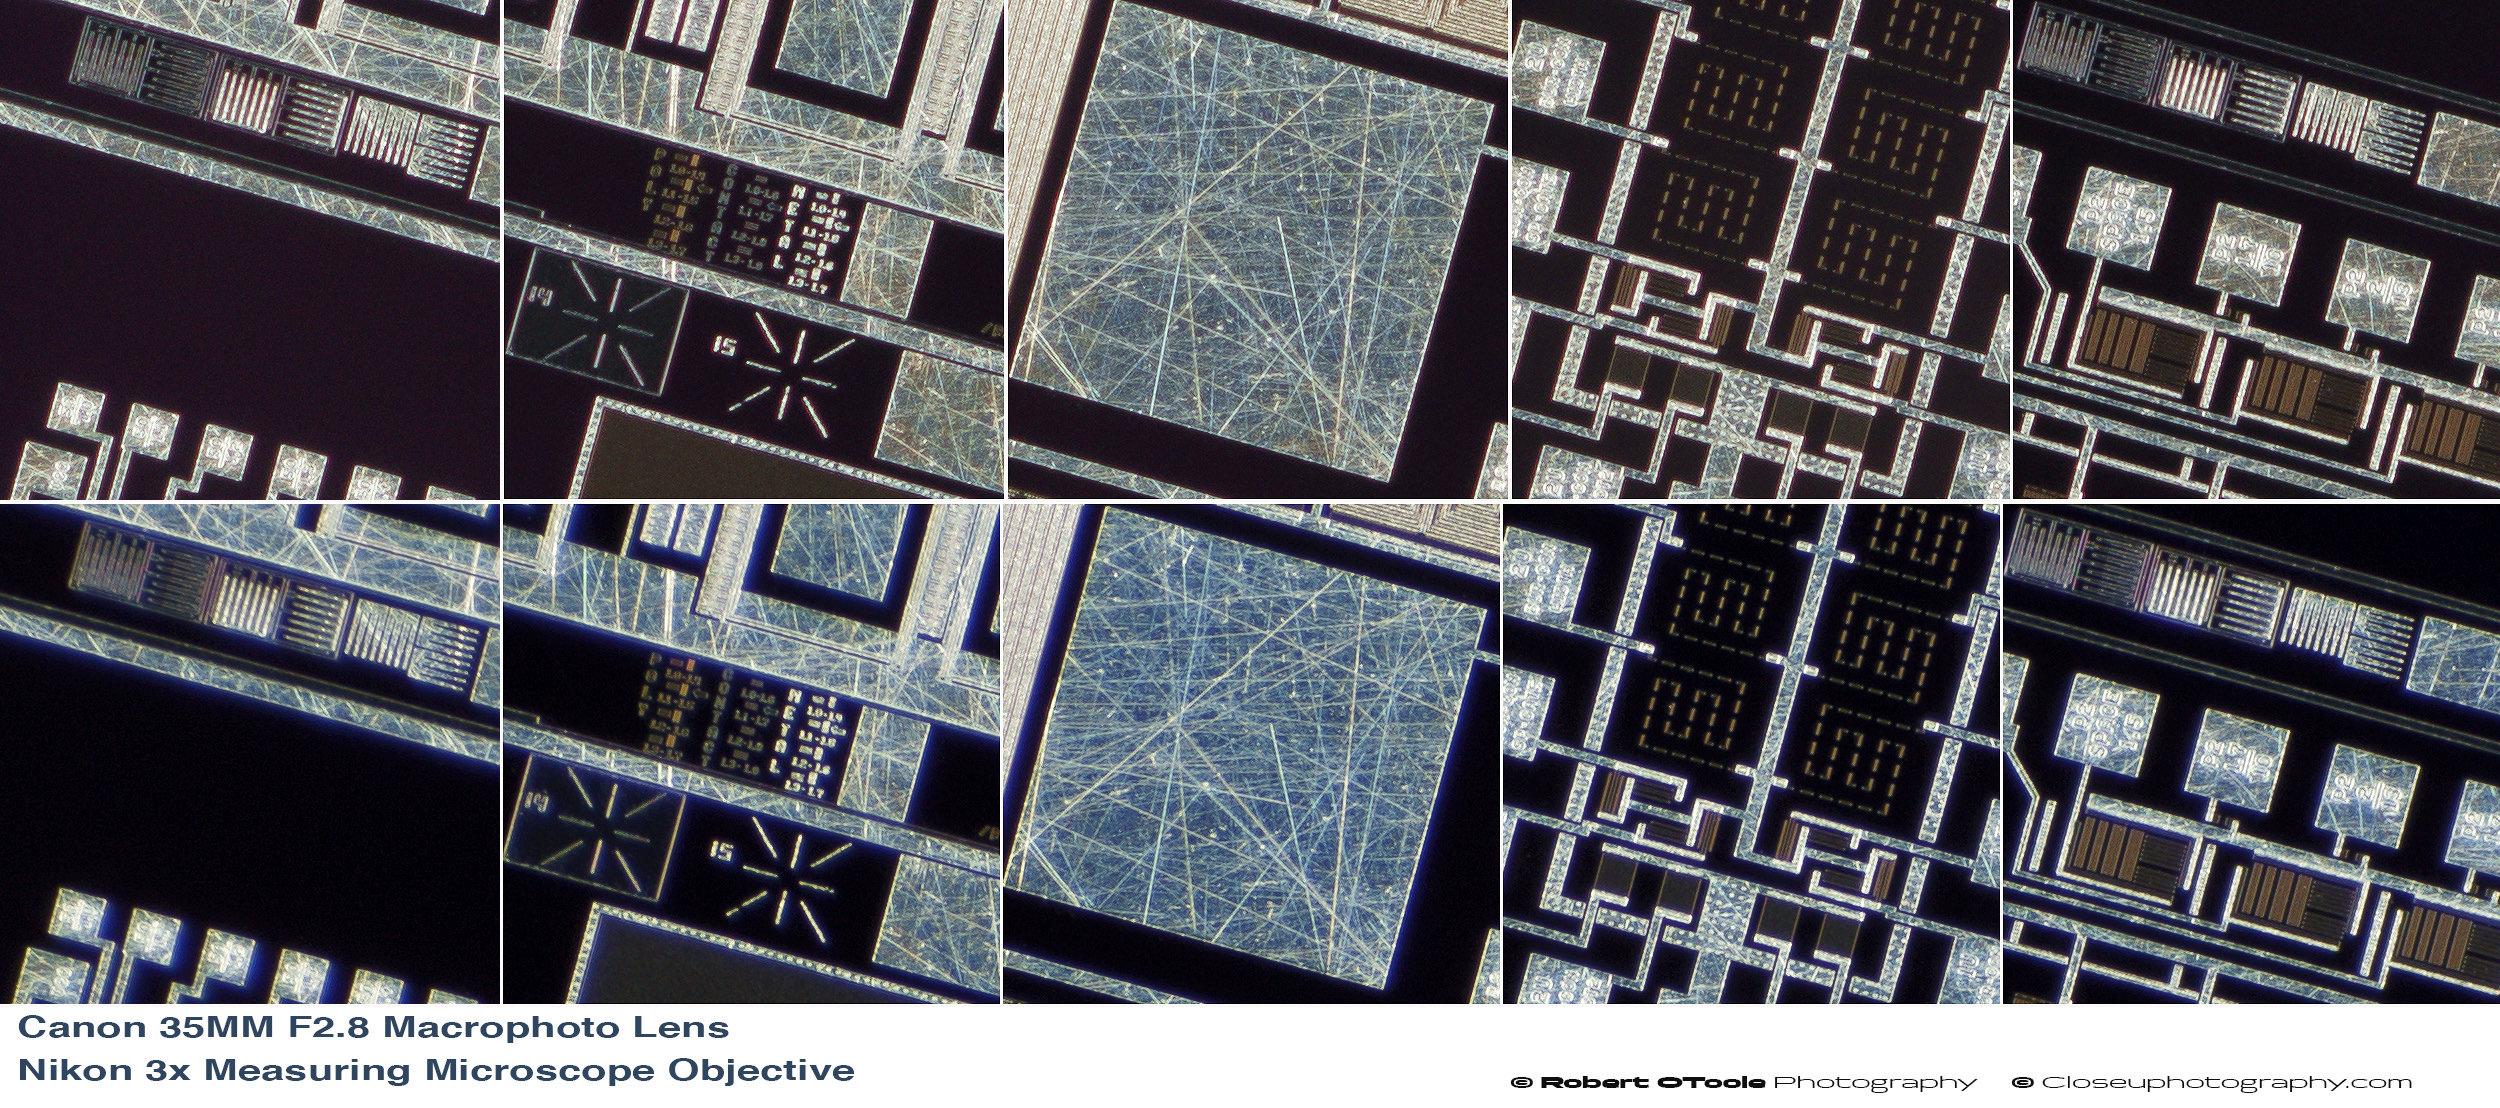 Nikon-3x-Measuring-Microscope-Objective-Lens-v-Canon-35MM-F2.8-Macrophoto-Lens-100-percent-crops-Closeuphotography.JPG